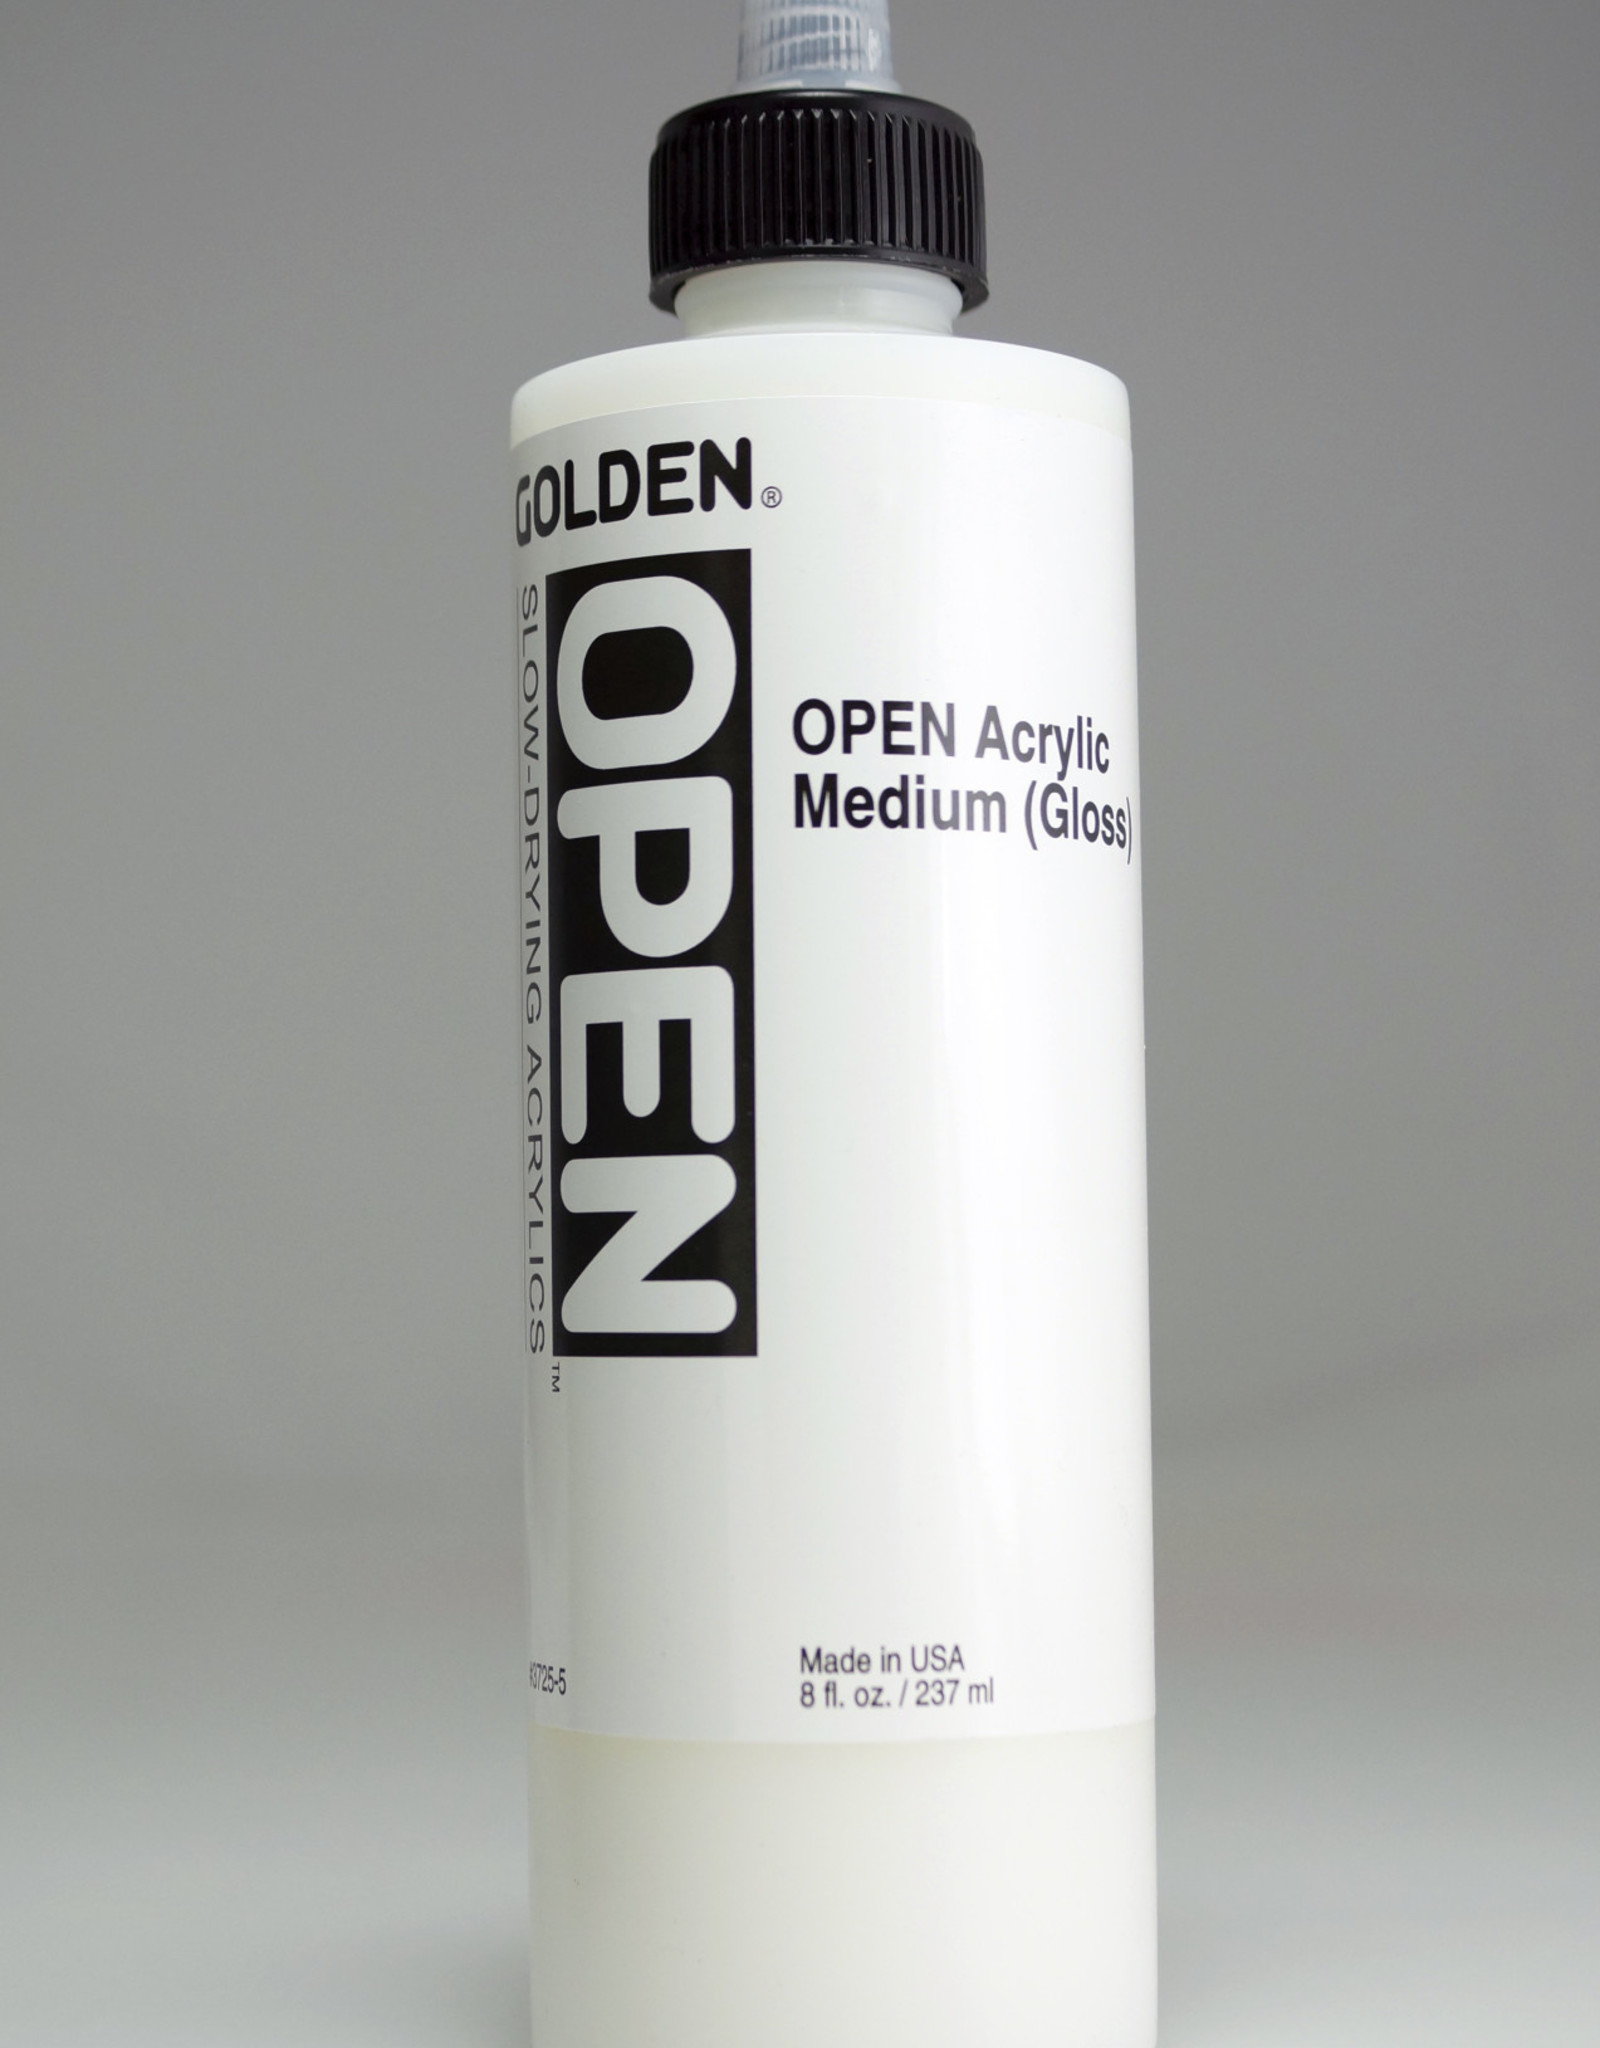 Golden OPEN Acrylic Medium, Gloss, 8 Fl Oz.